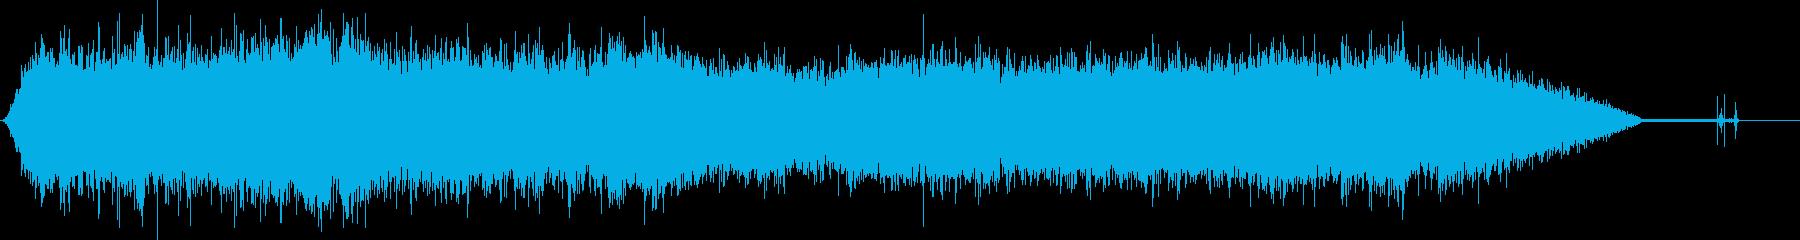 100 Mph以上を運転する中型セ...の再生済みの波形